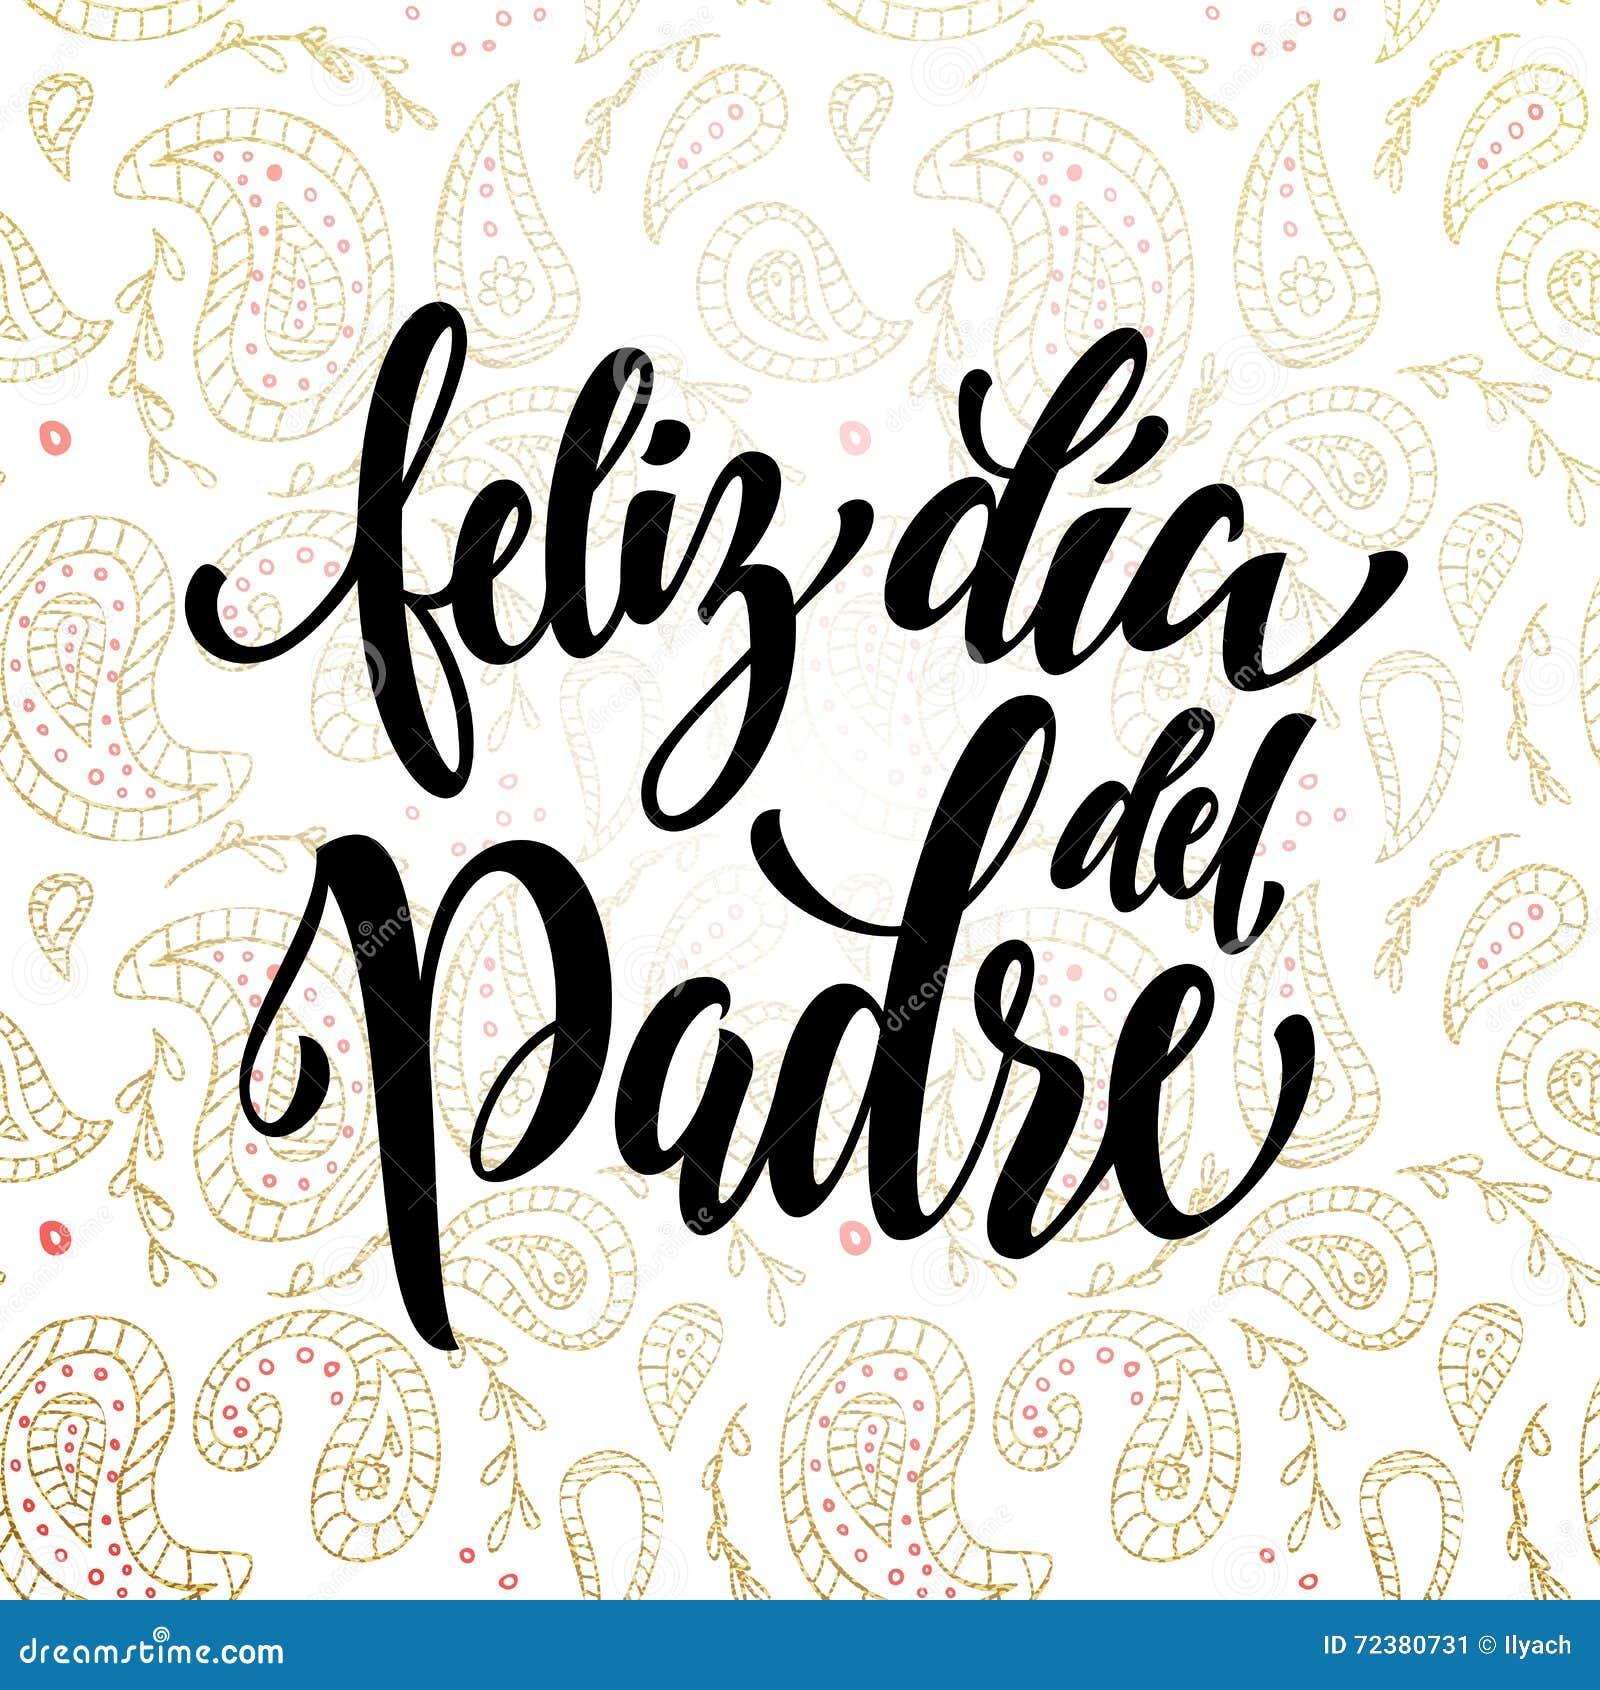 ... Art feliz dia del padre father day greeting card in spanish stock